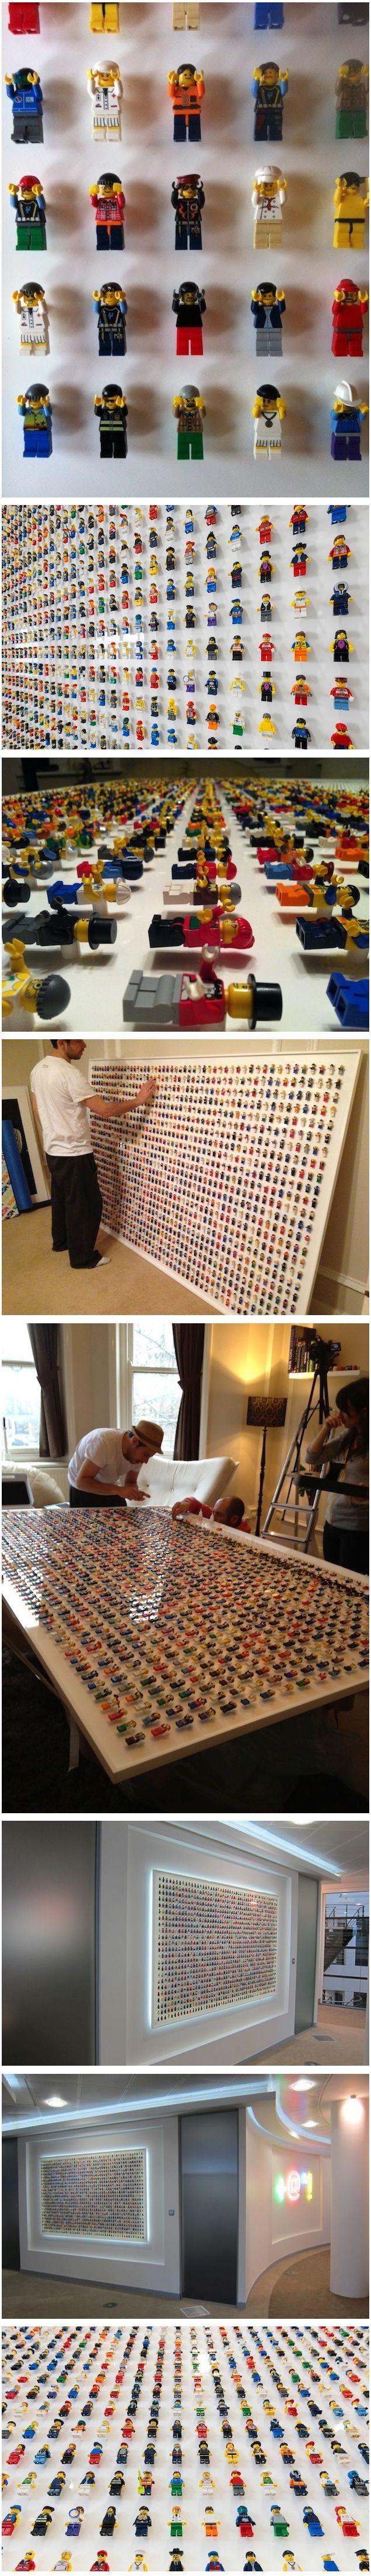 1.200 #LEGO Minifigures